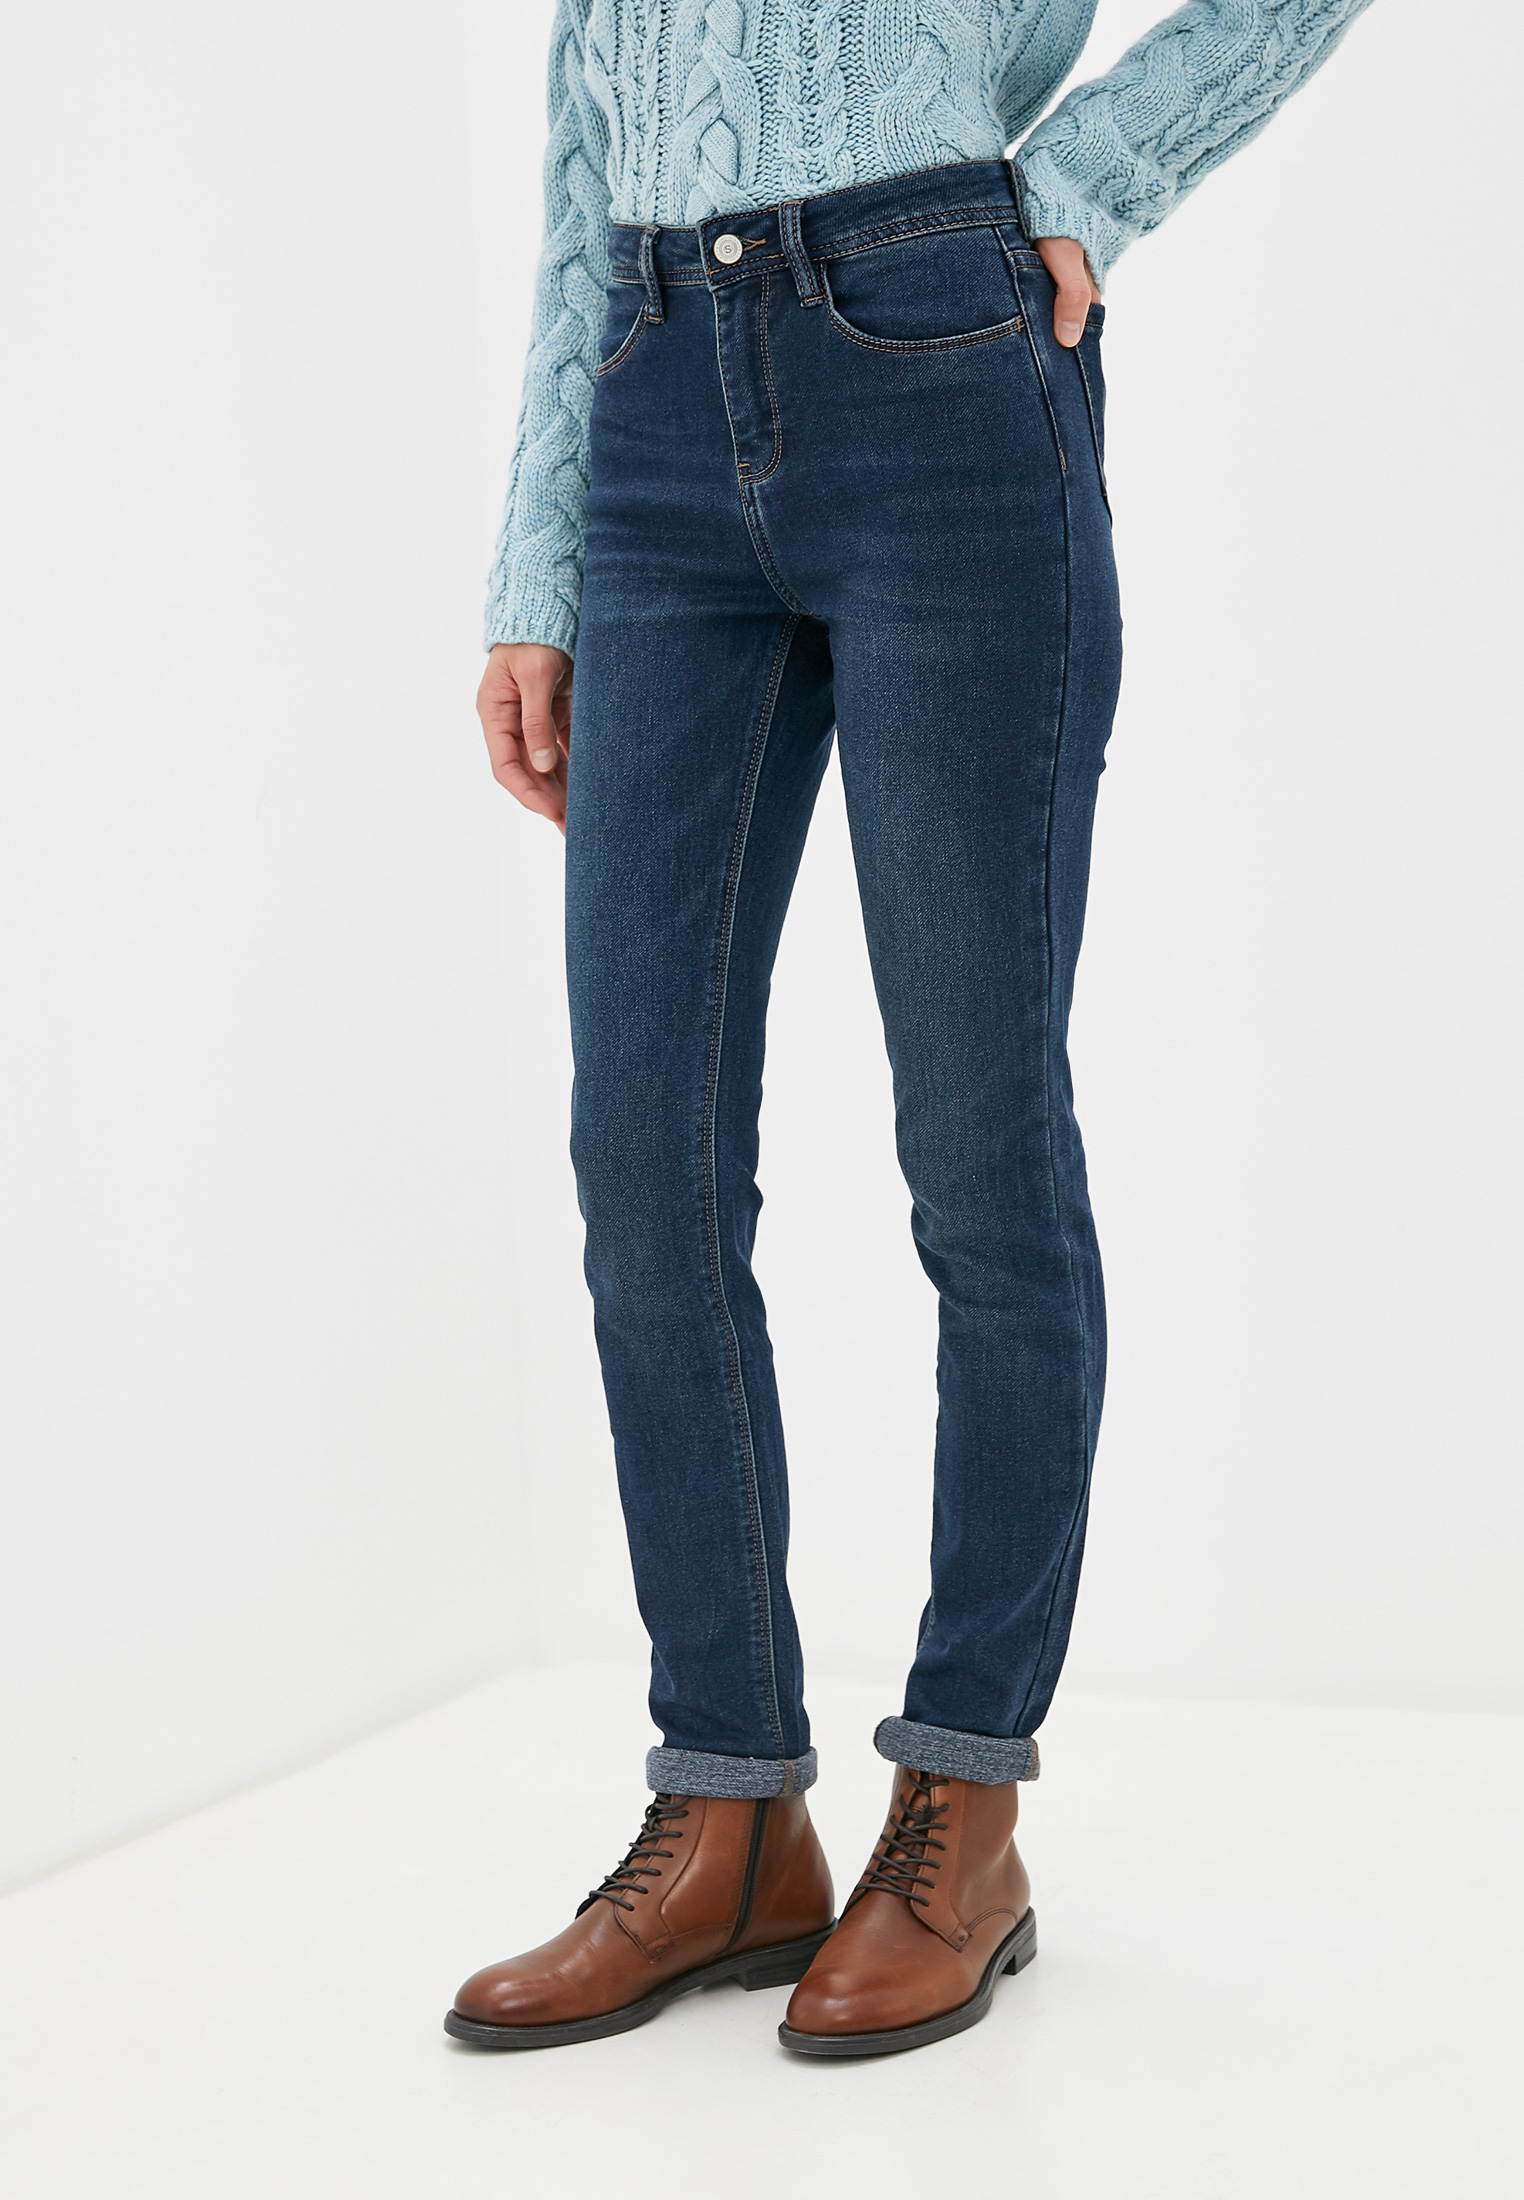 Зауженные джинсы Sela (Сэла) PJ-135/686-9432